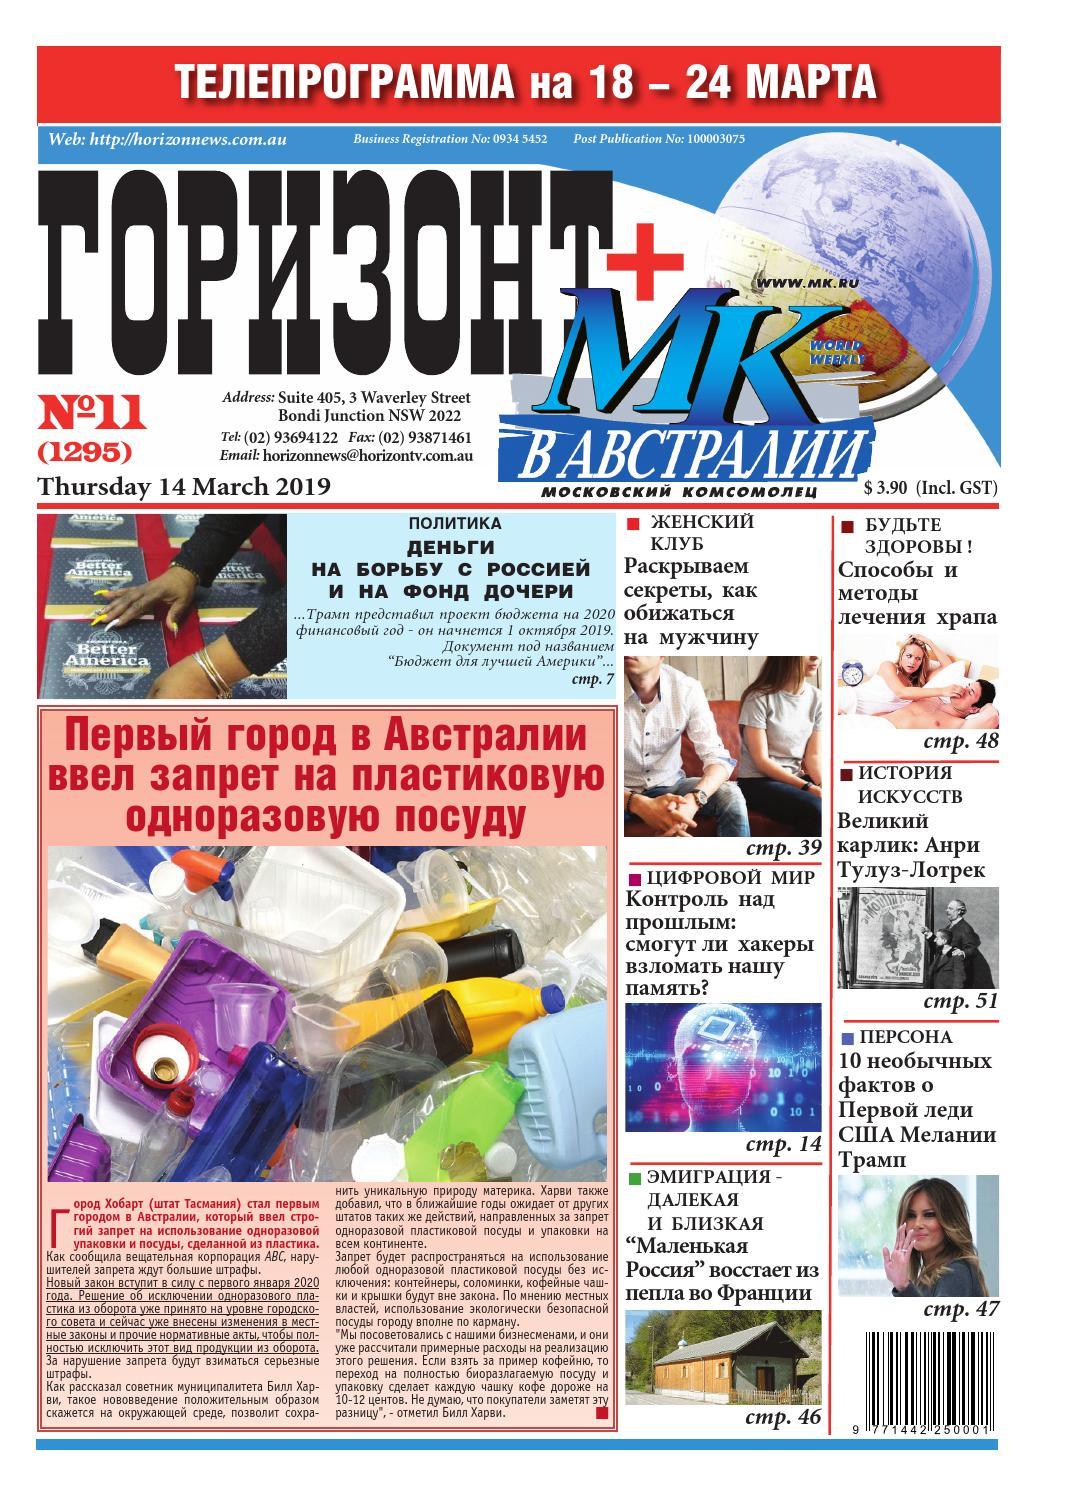 de6a0c2b8c0 Горизонт № 11 by Horizon Media Group - issuu